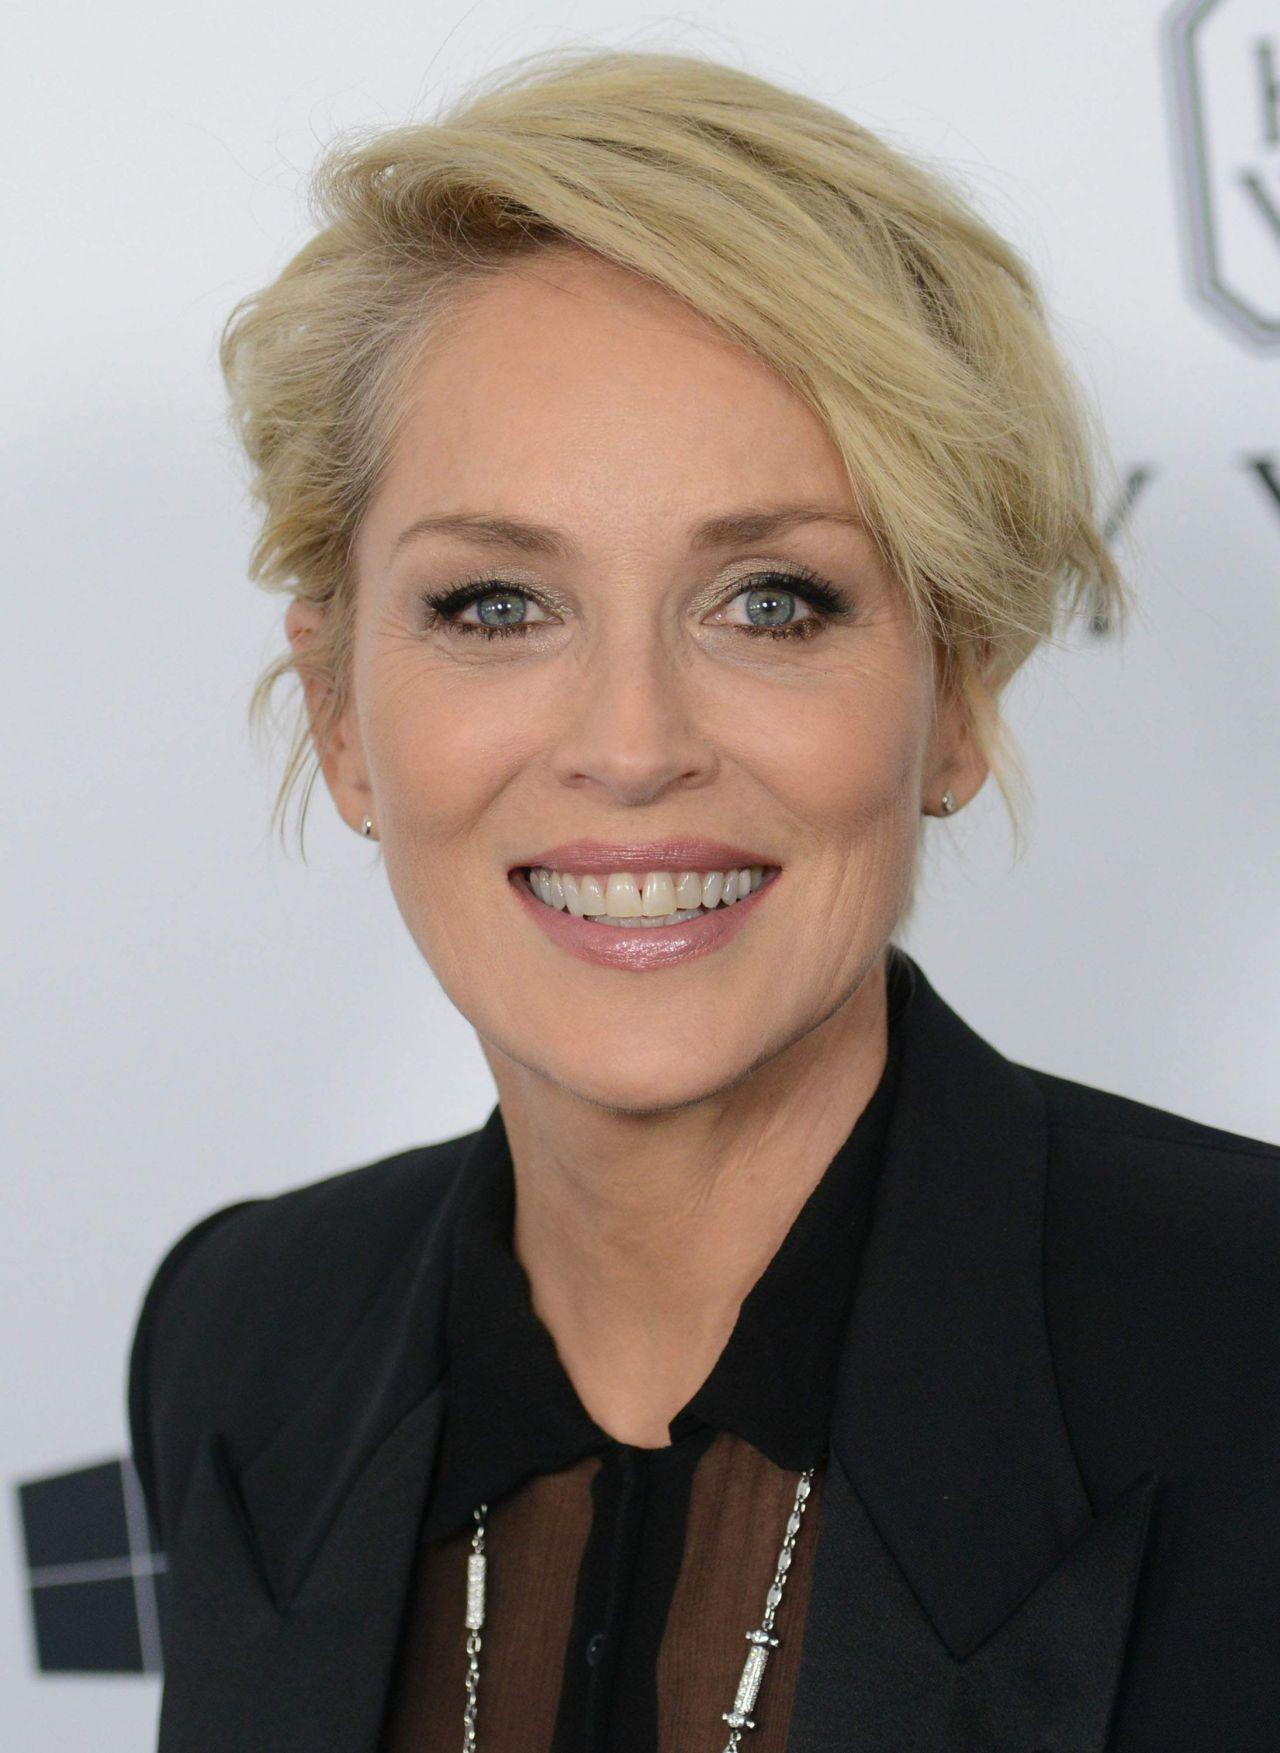 <b>Sharon Stone</b> – 2015 amfAR's Inspiration Gala Los Angeles in Hollywood - sharon-stone-2015-amfar-s-inspiration-gala-los-angeles-in-hollywood_1